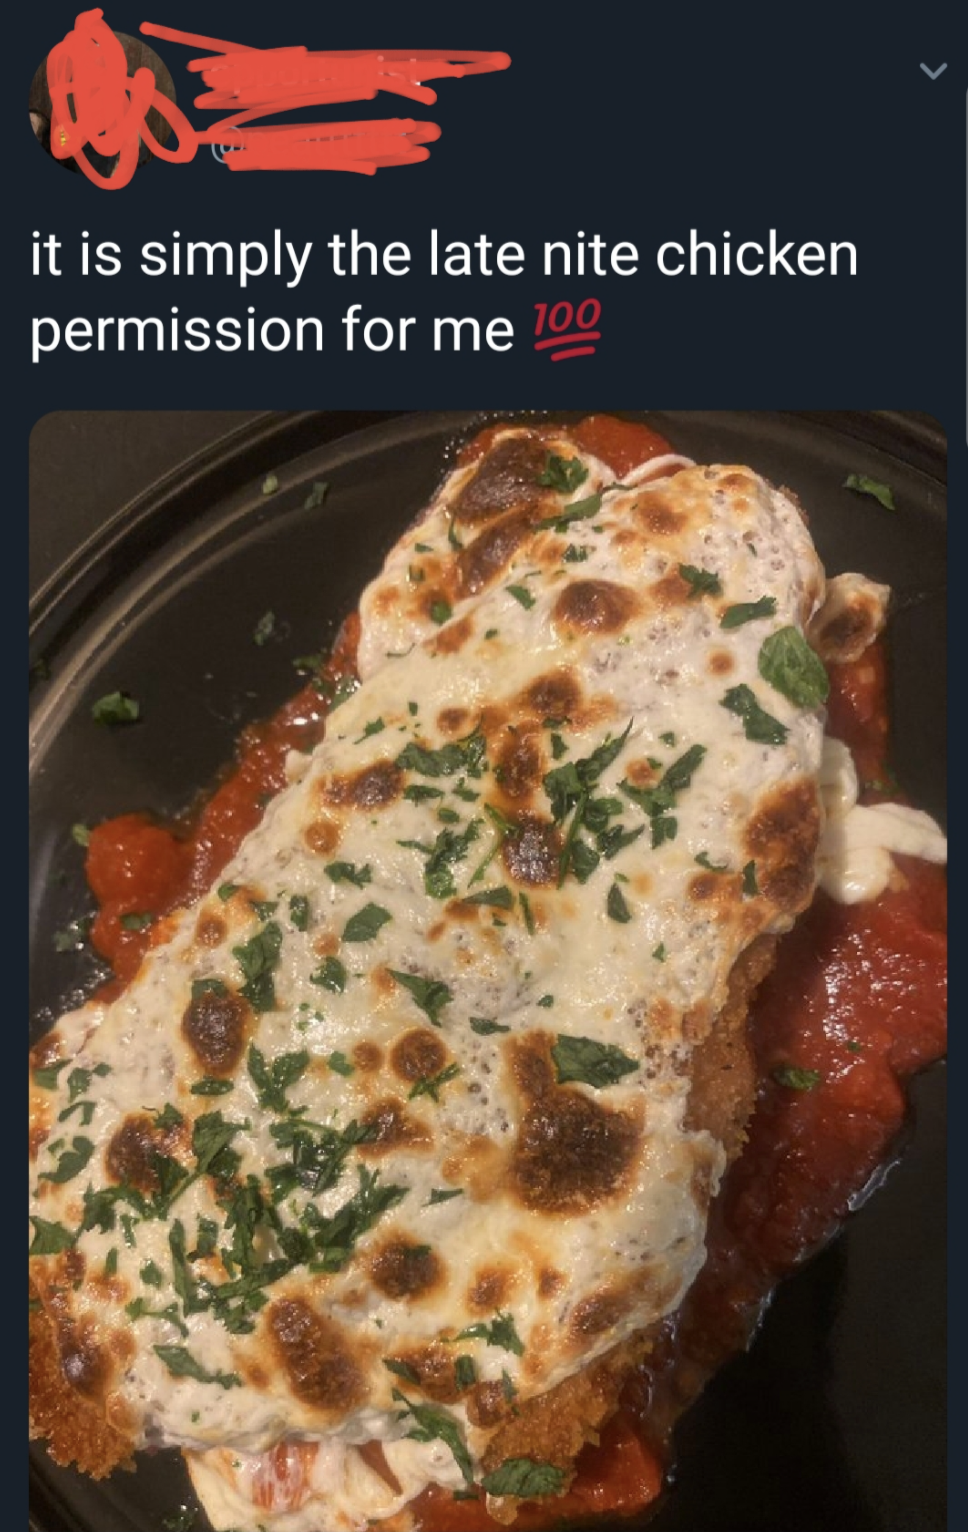 person calling chicken parm chiicken permission